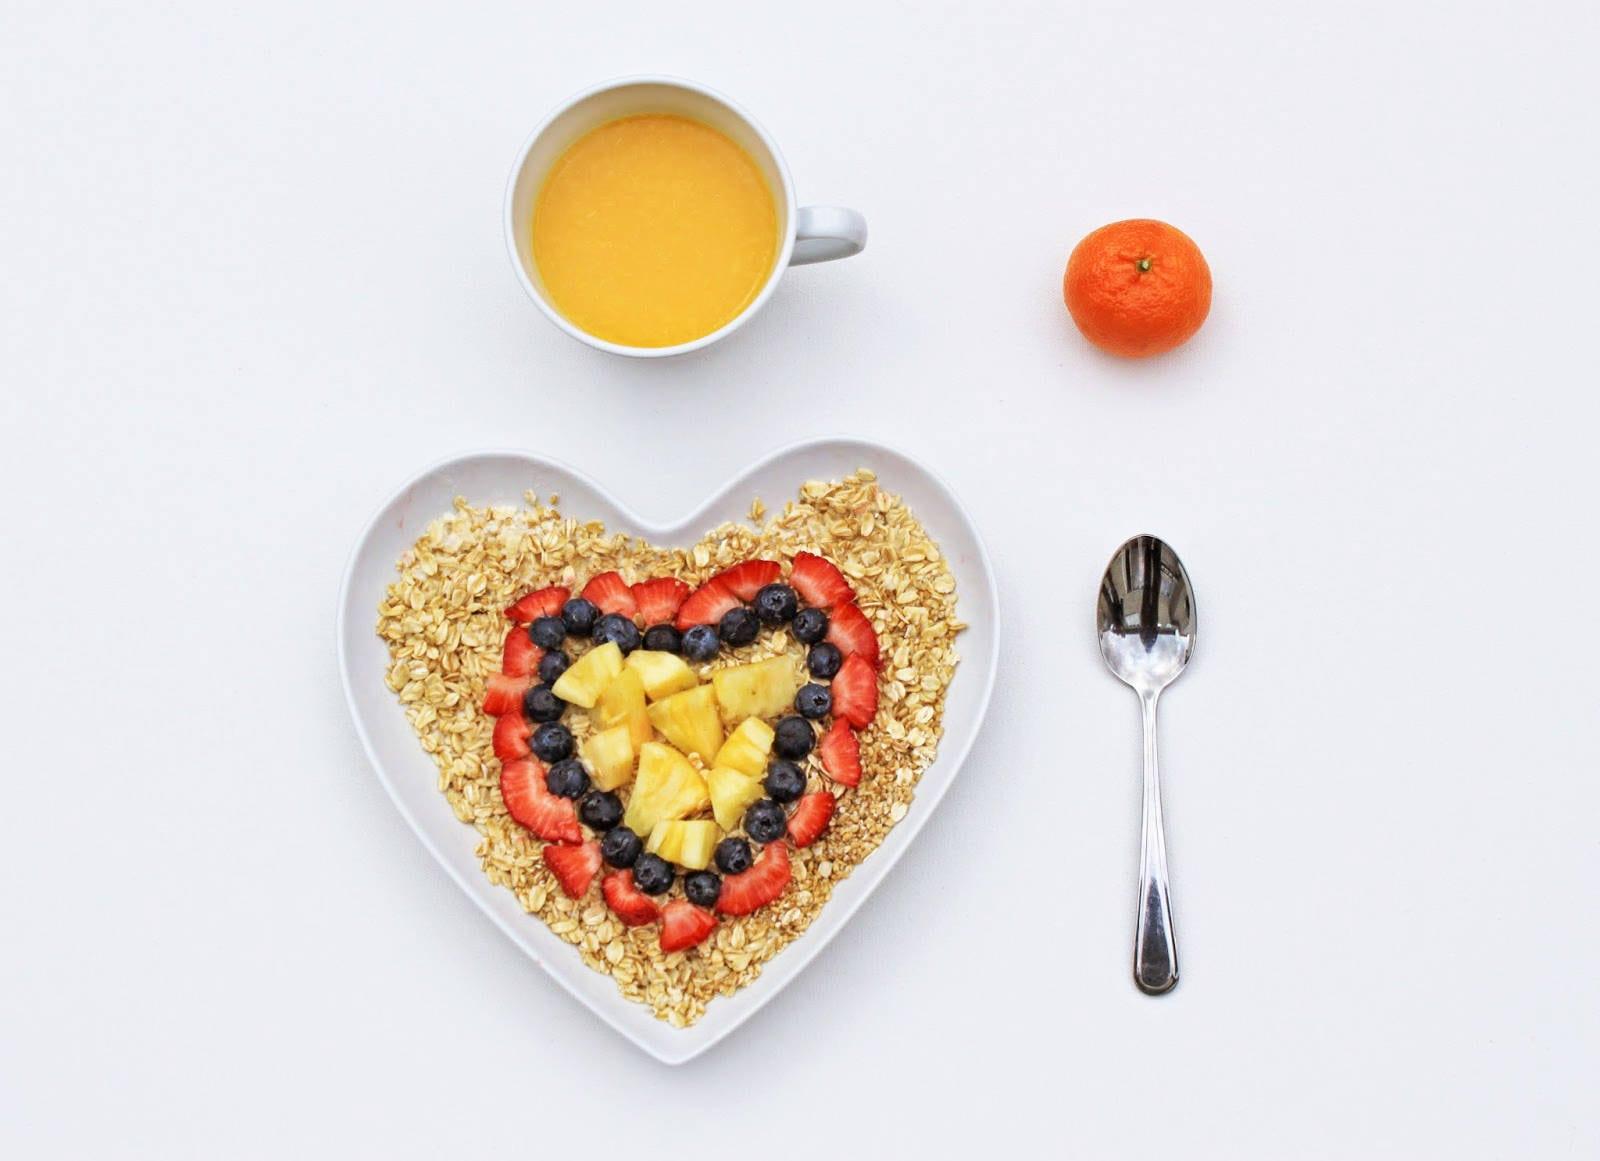 5-Minute Oatmeal Parfait